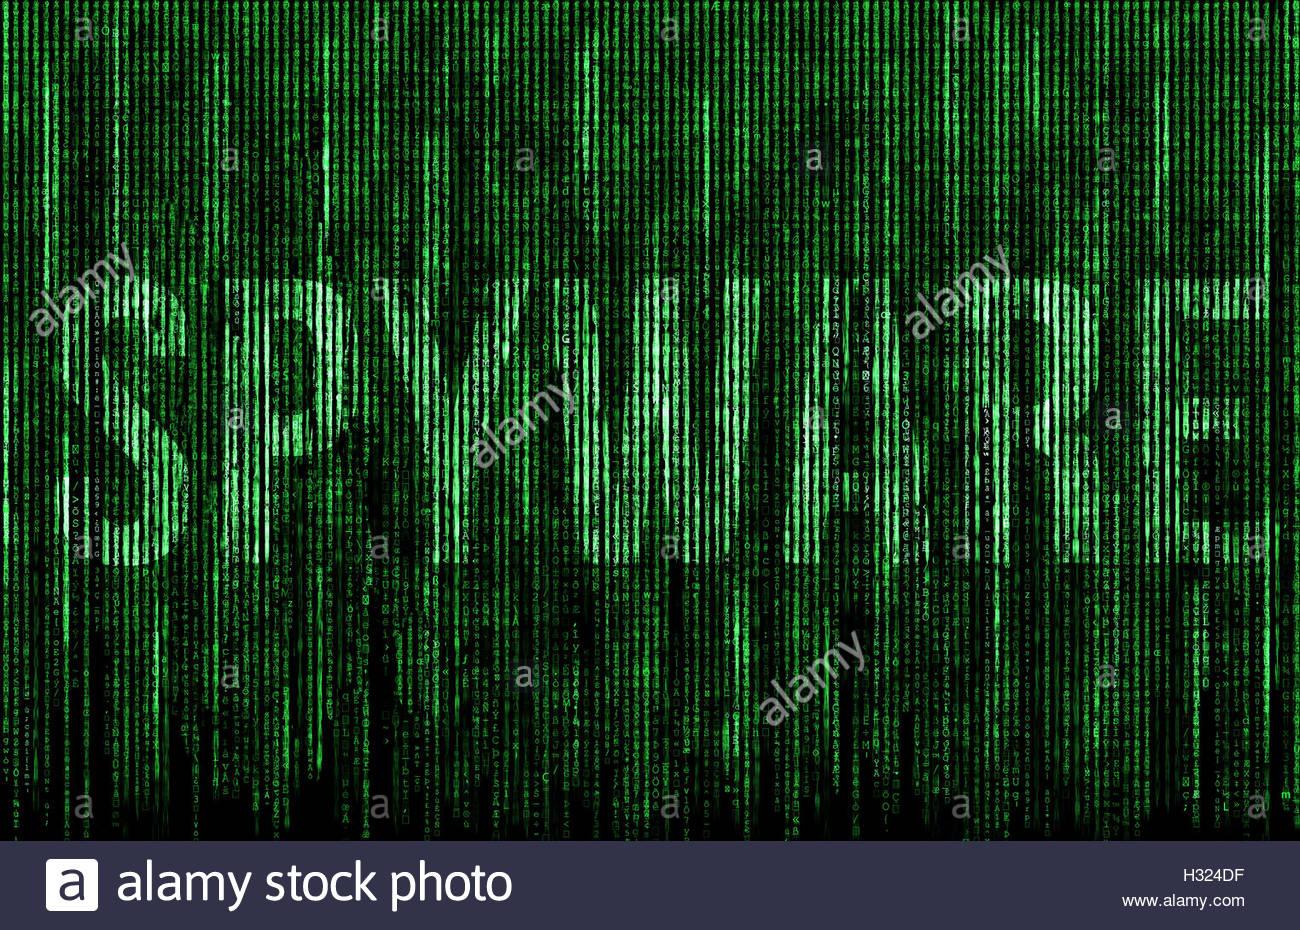 Spyware-digital-Matrix-Darstellung Stockbild